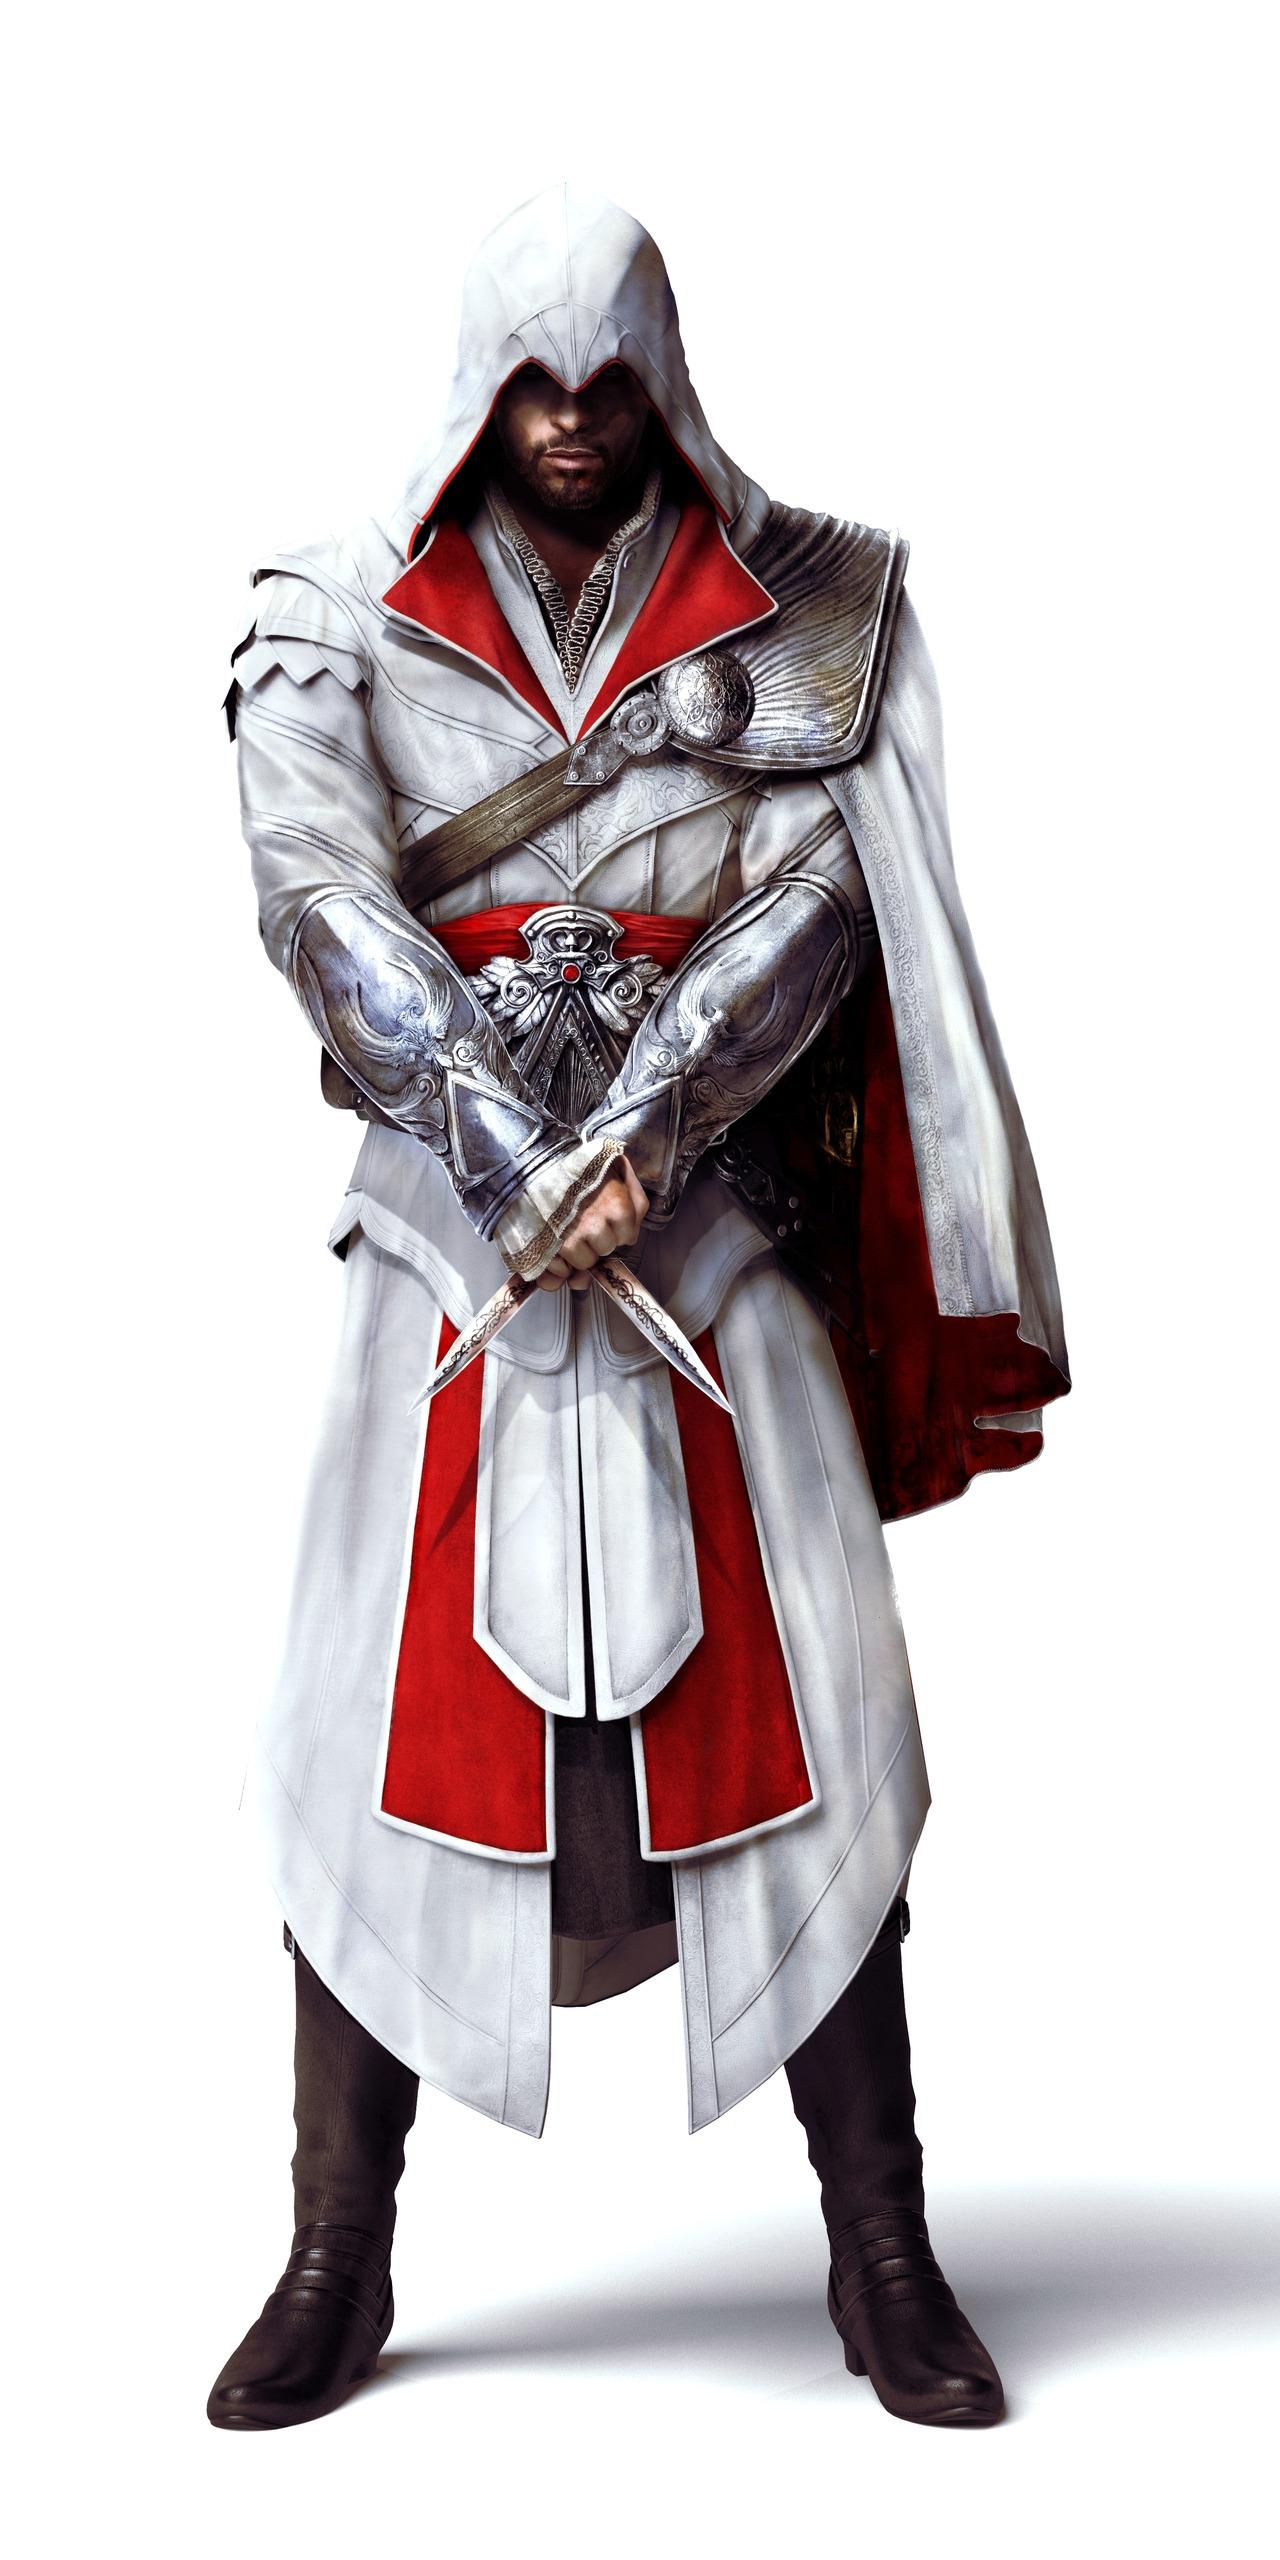 AssassinsCreedBrotherhood Visuel003